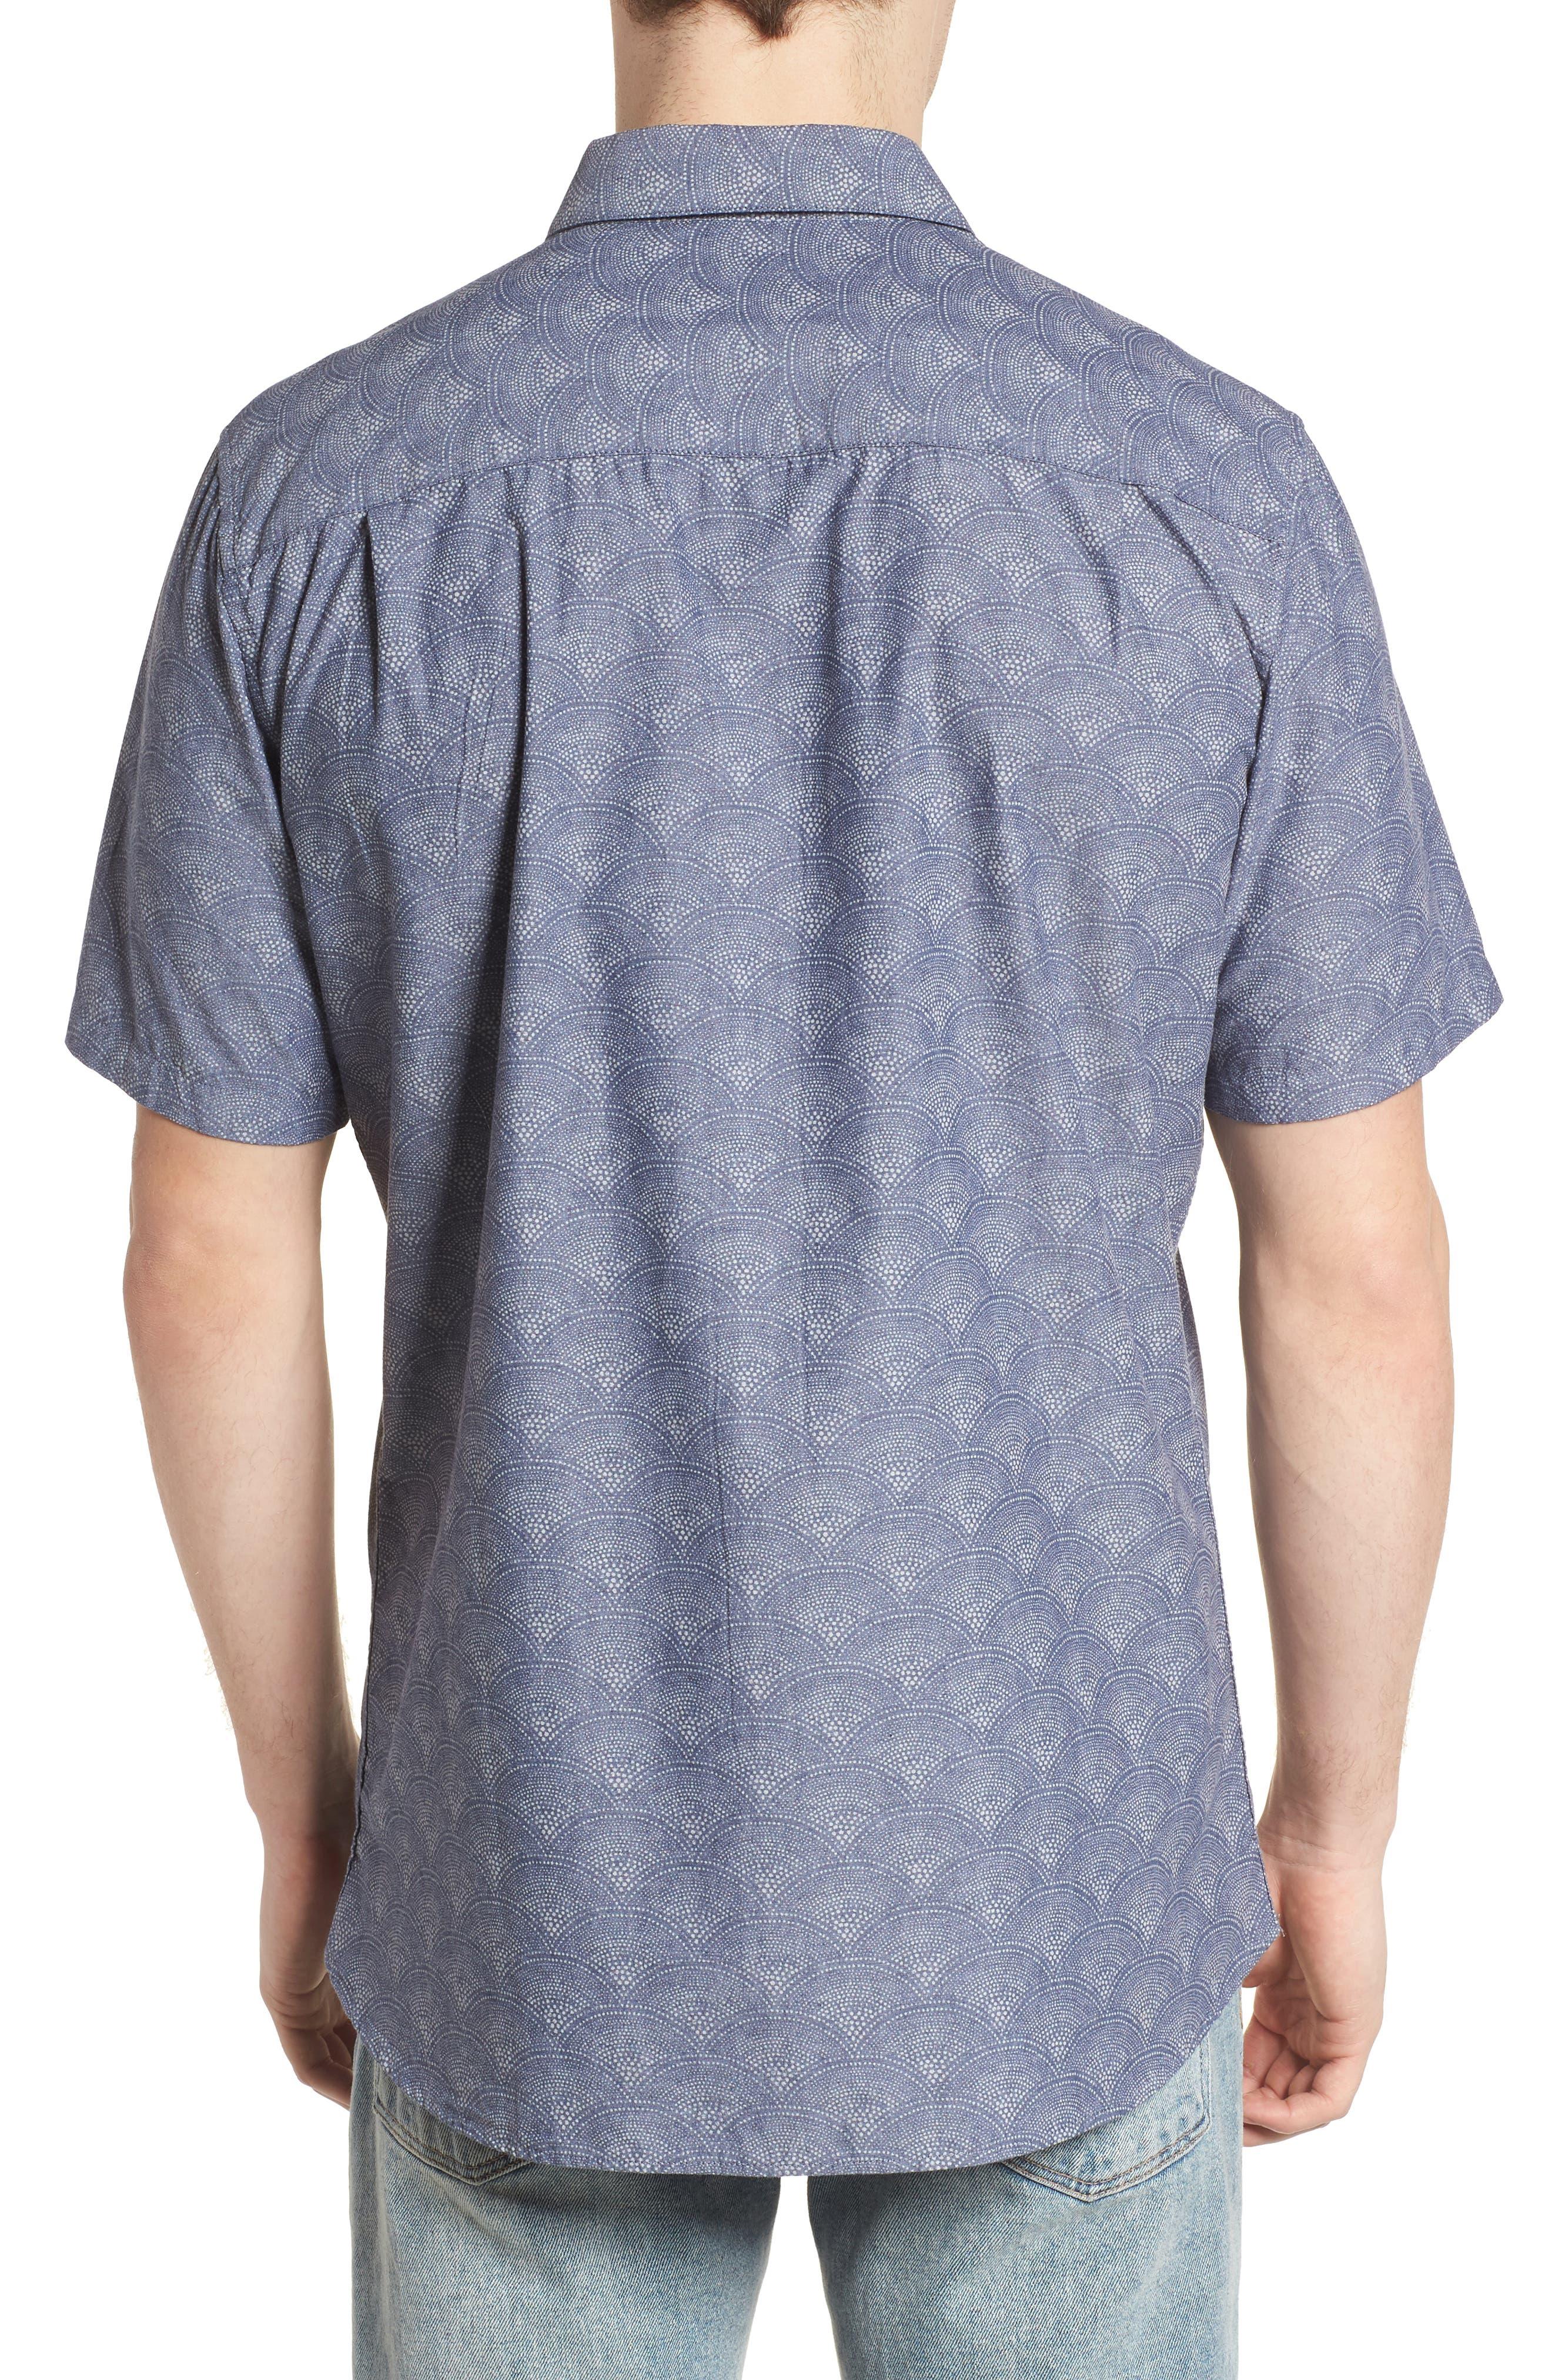 Pescado Short Sleeve Oxford Shirt,                             Alternate thumbnail 2, color,                             Obsidian